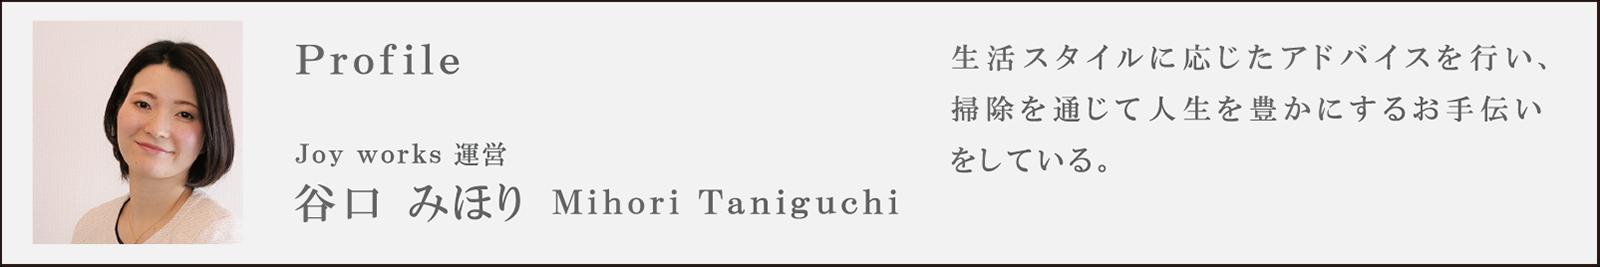 Joy works運営 谷口 みほり Mihori Taniguchi